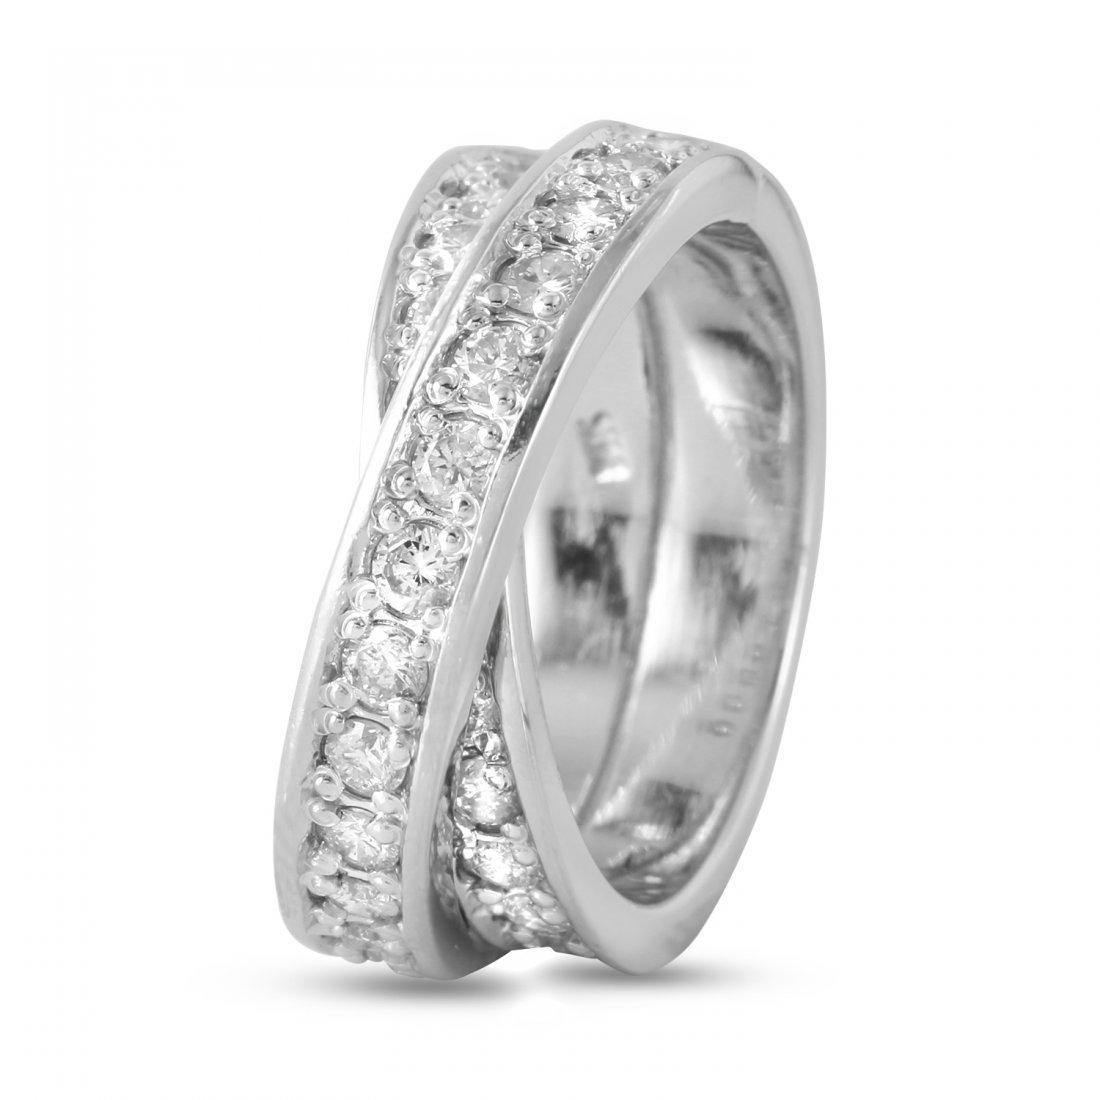 Ladies 1.5CTW Diamond 14K White Gold Ring